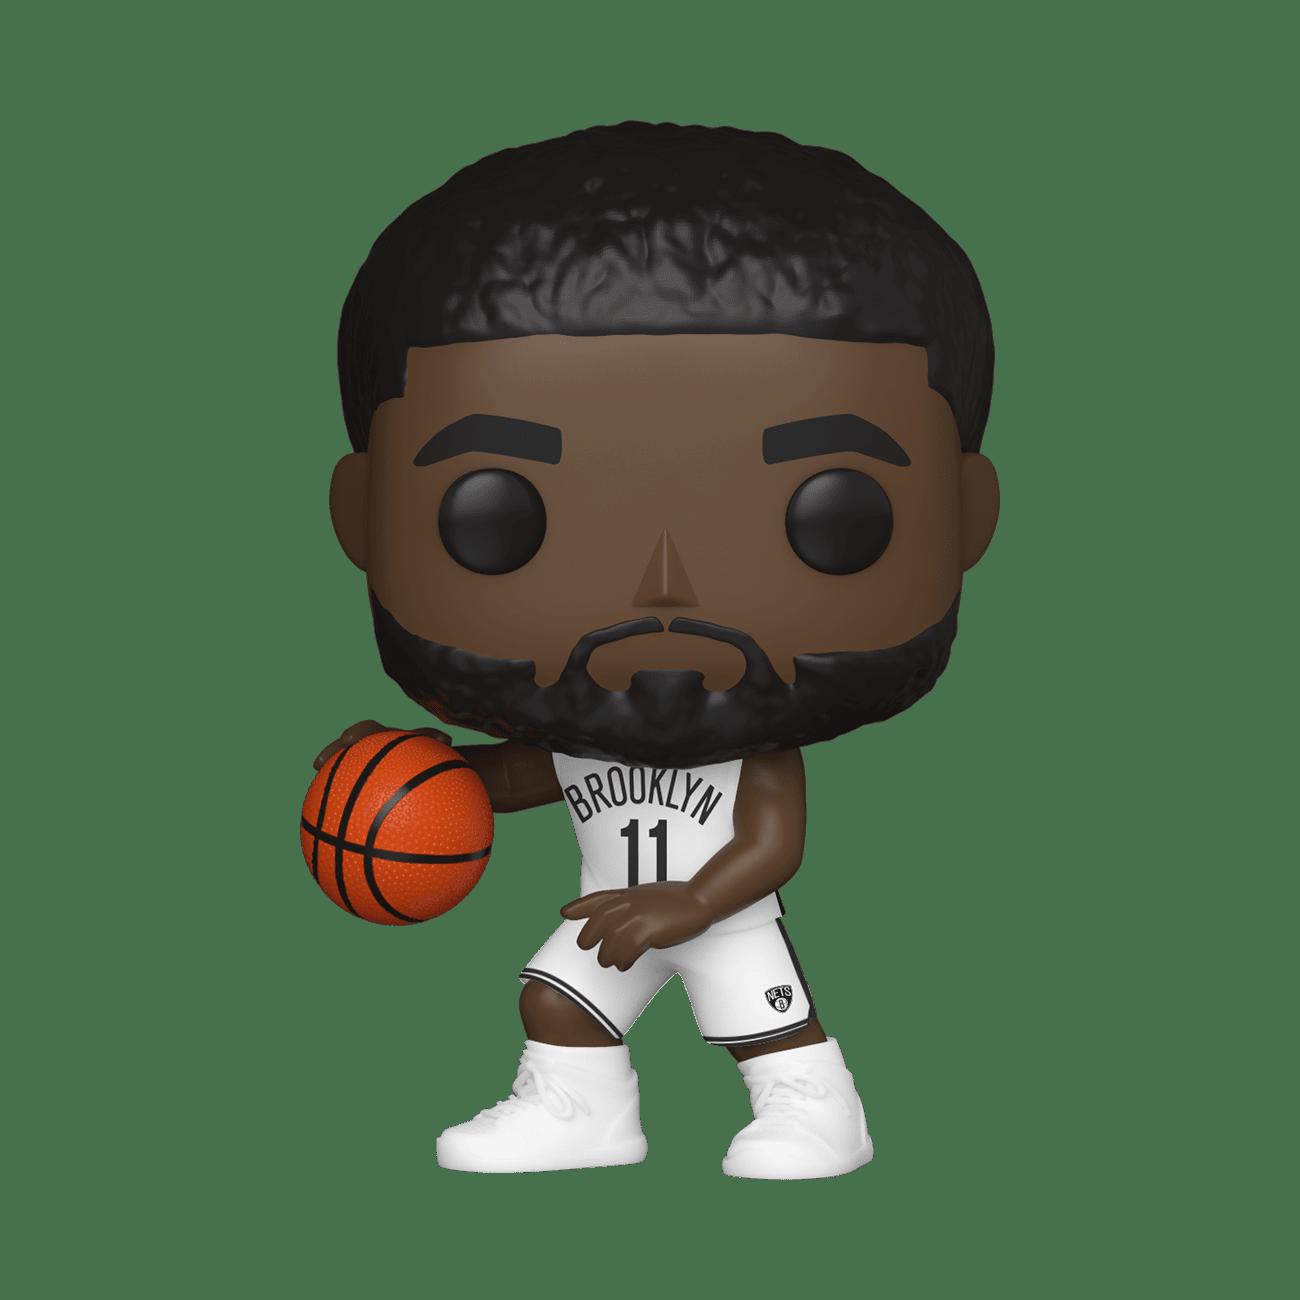 PRE-ORDER NBA: Nets - Kyrie Irving POP! Vinyl Figure